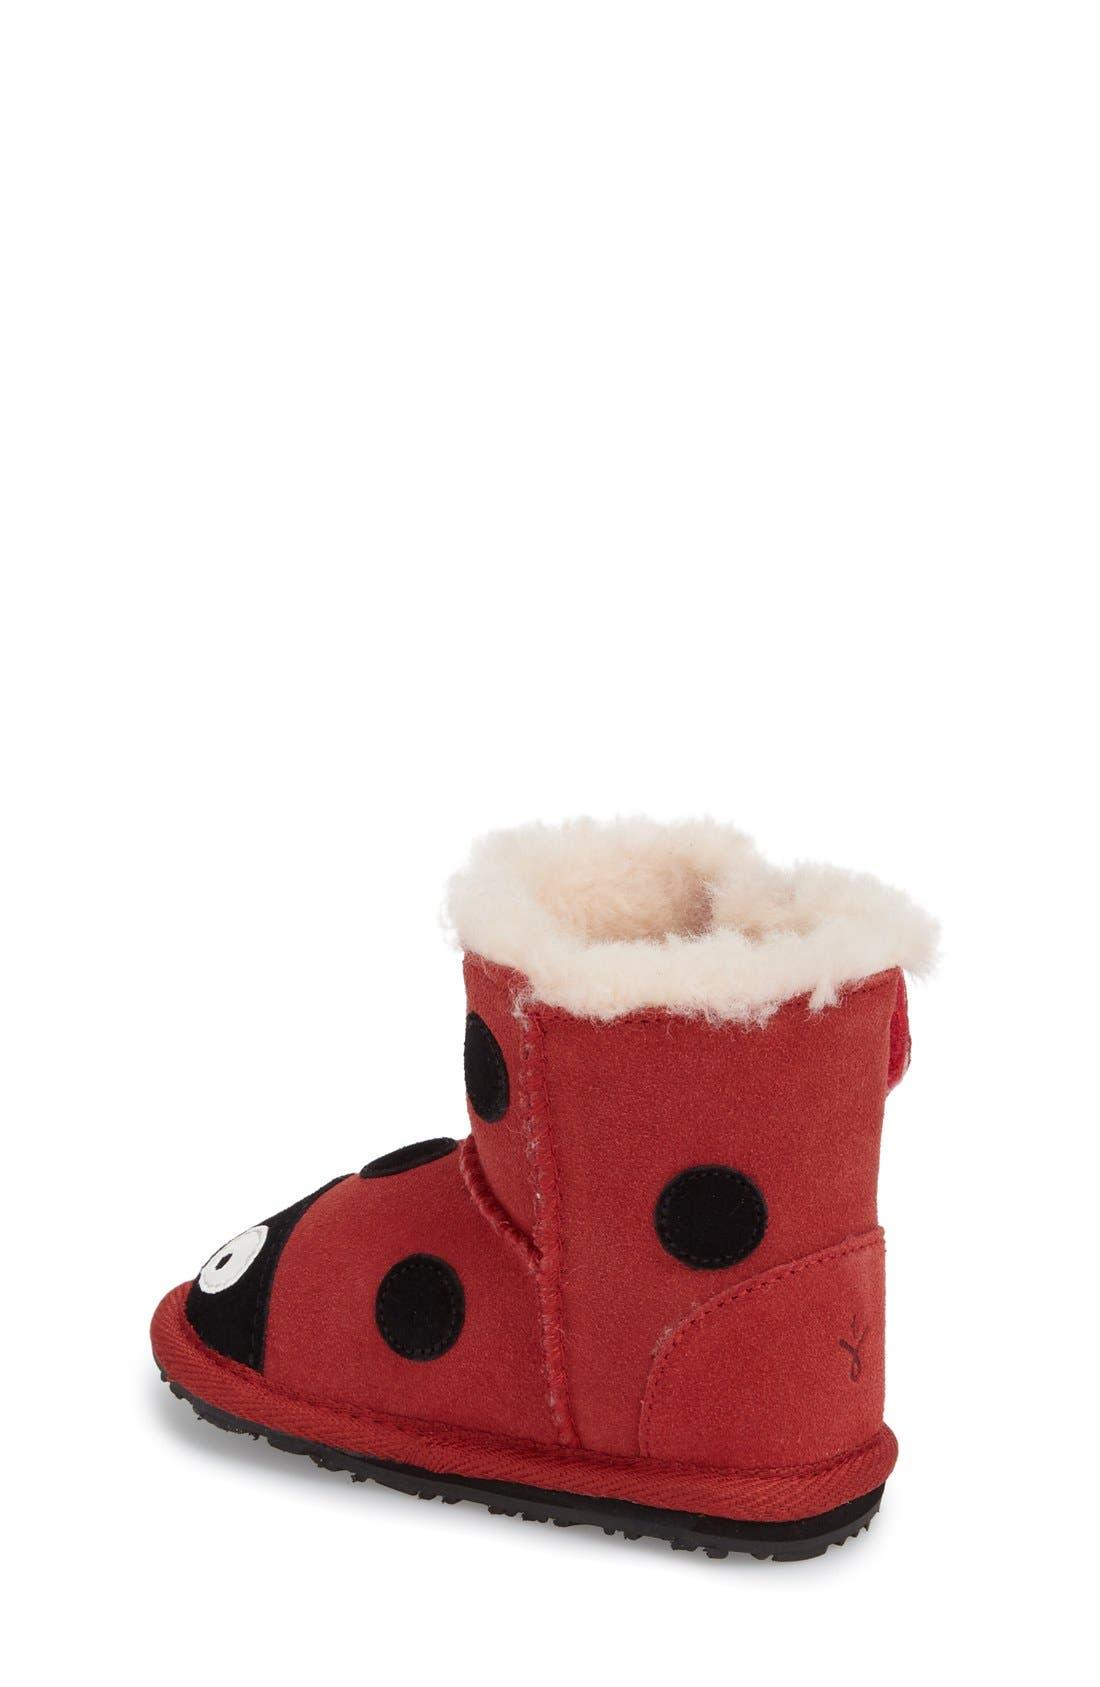 Alternate Image 2  - EMU Australia 'Ladybug' Boot (Baby & Walker)